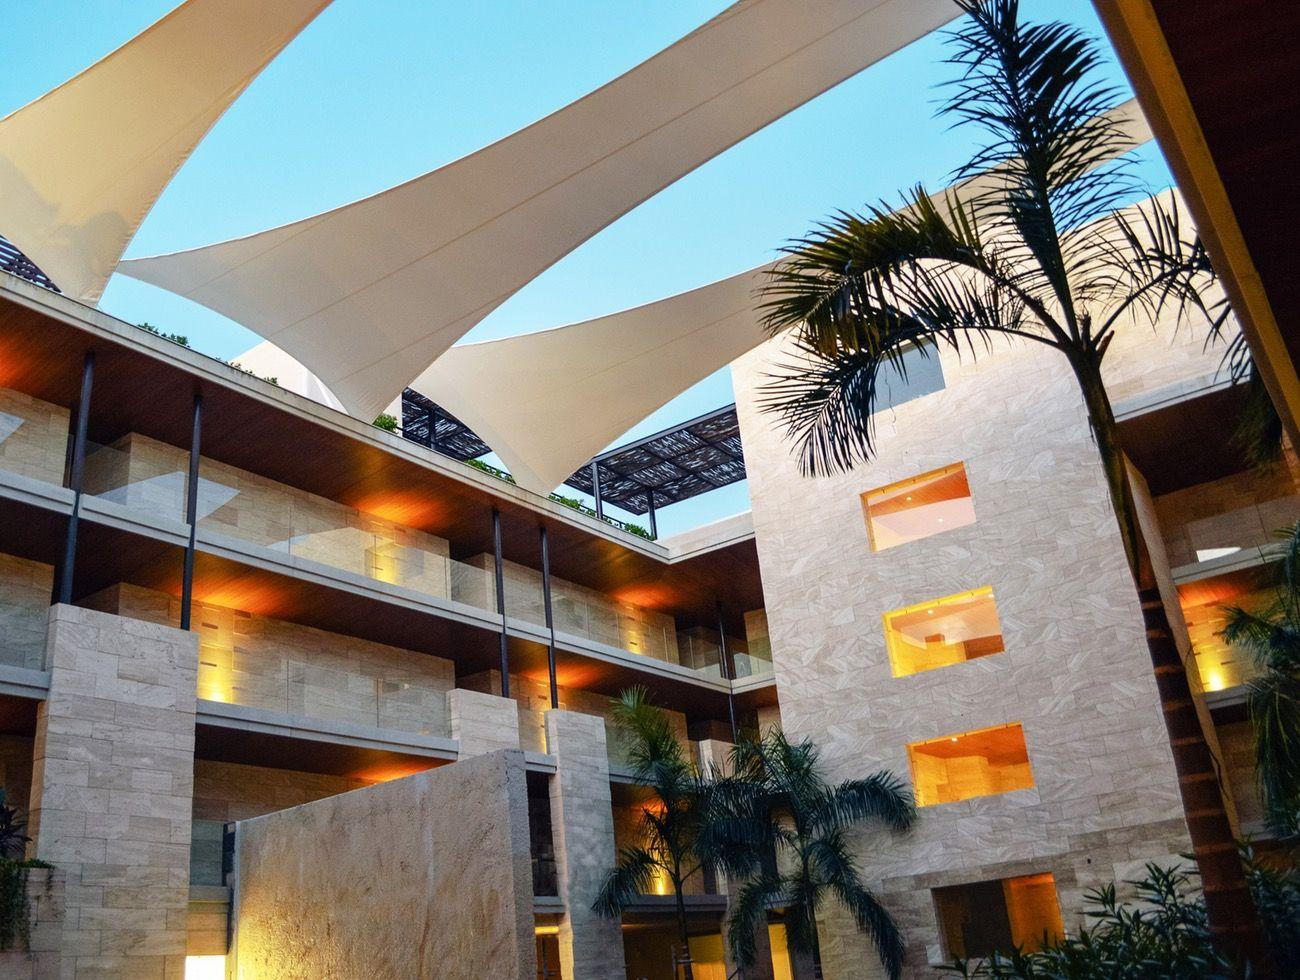 Boutique Hotel in the Heart of Playa del Carmen